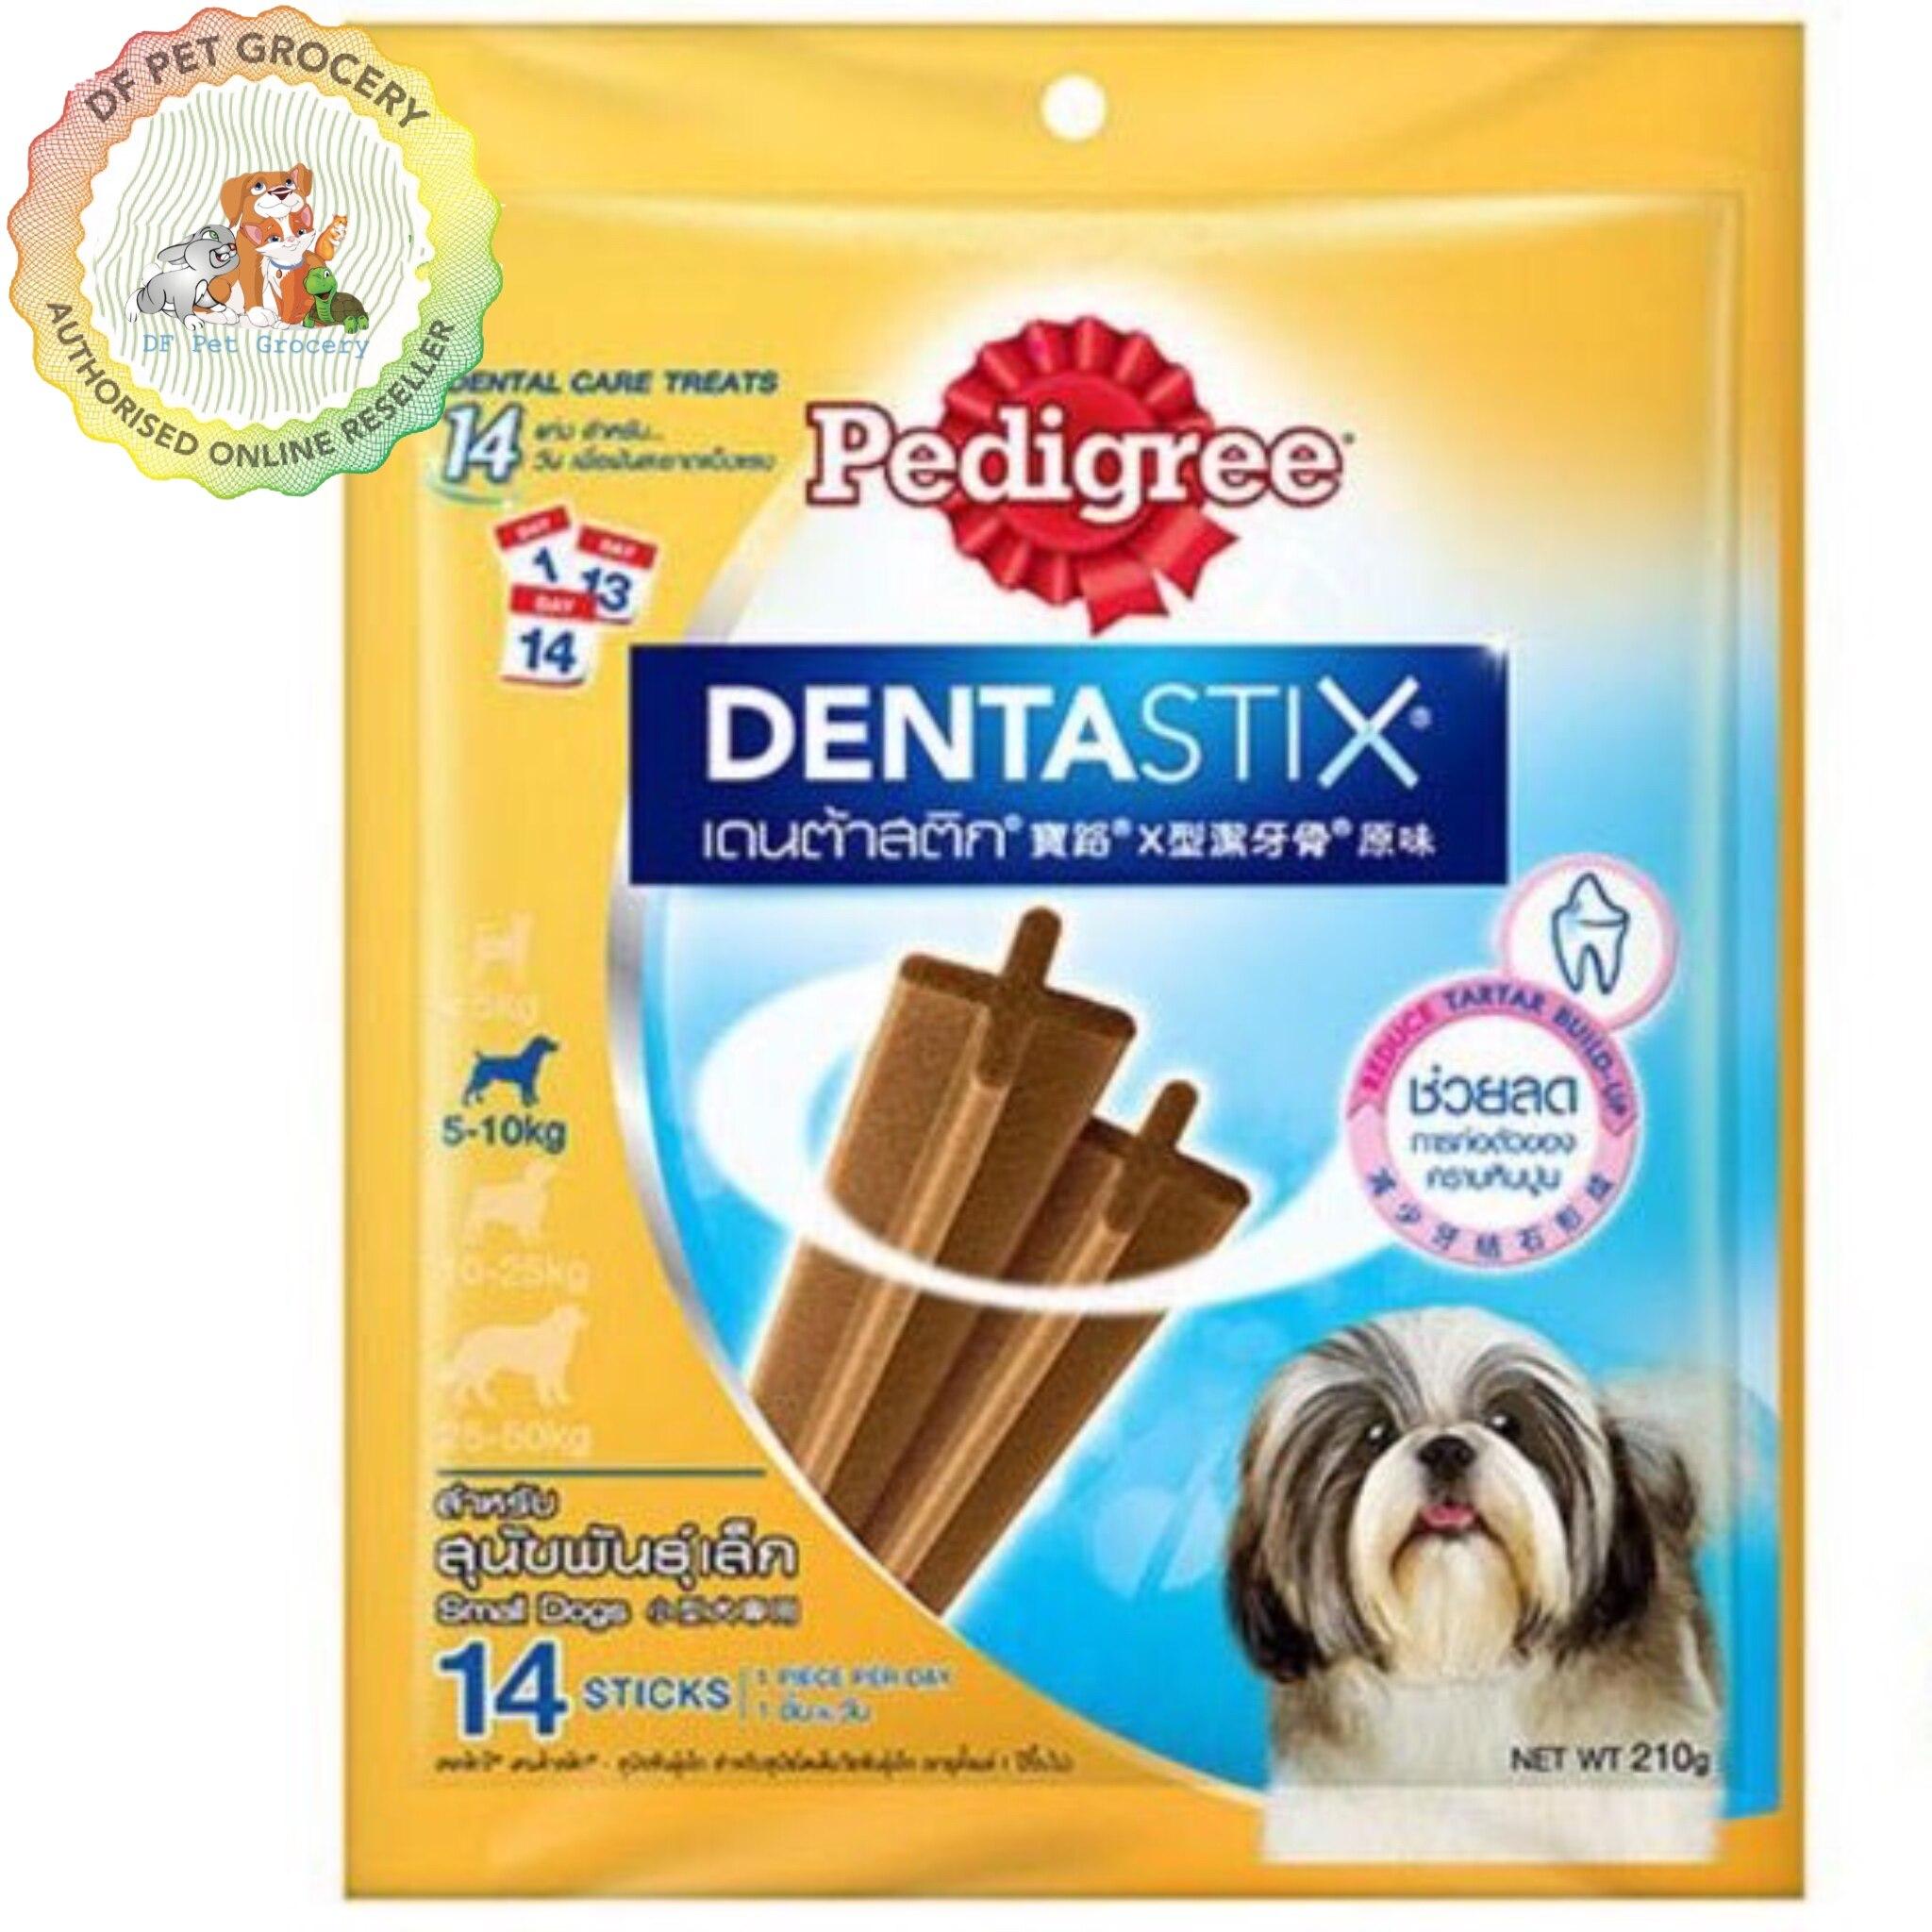 Pedigree Dentastix Small 210g - Dog Treats Ped Dentastix